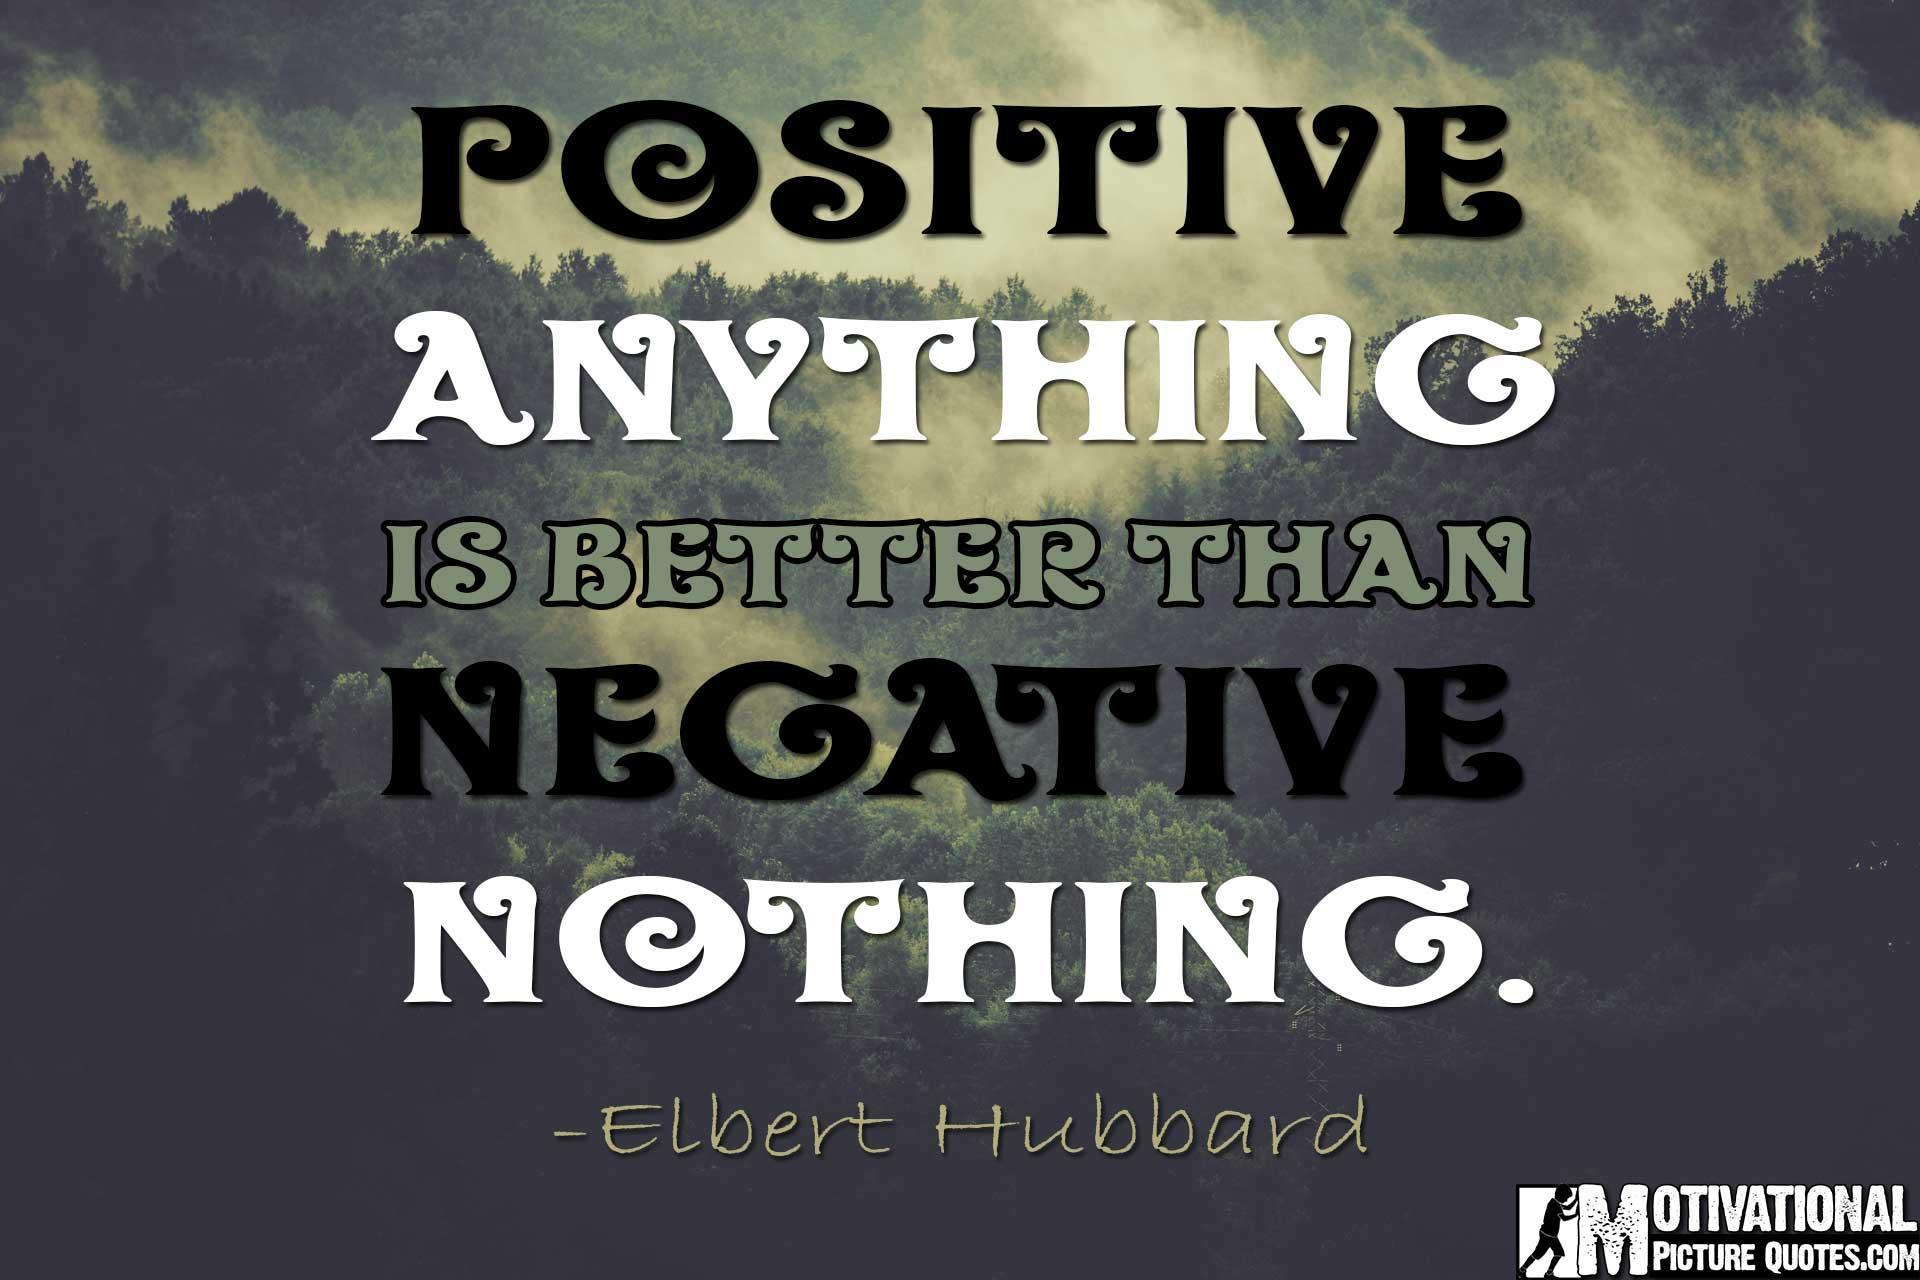 elbert hubbard quote power of positive thinking